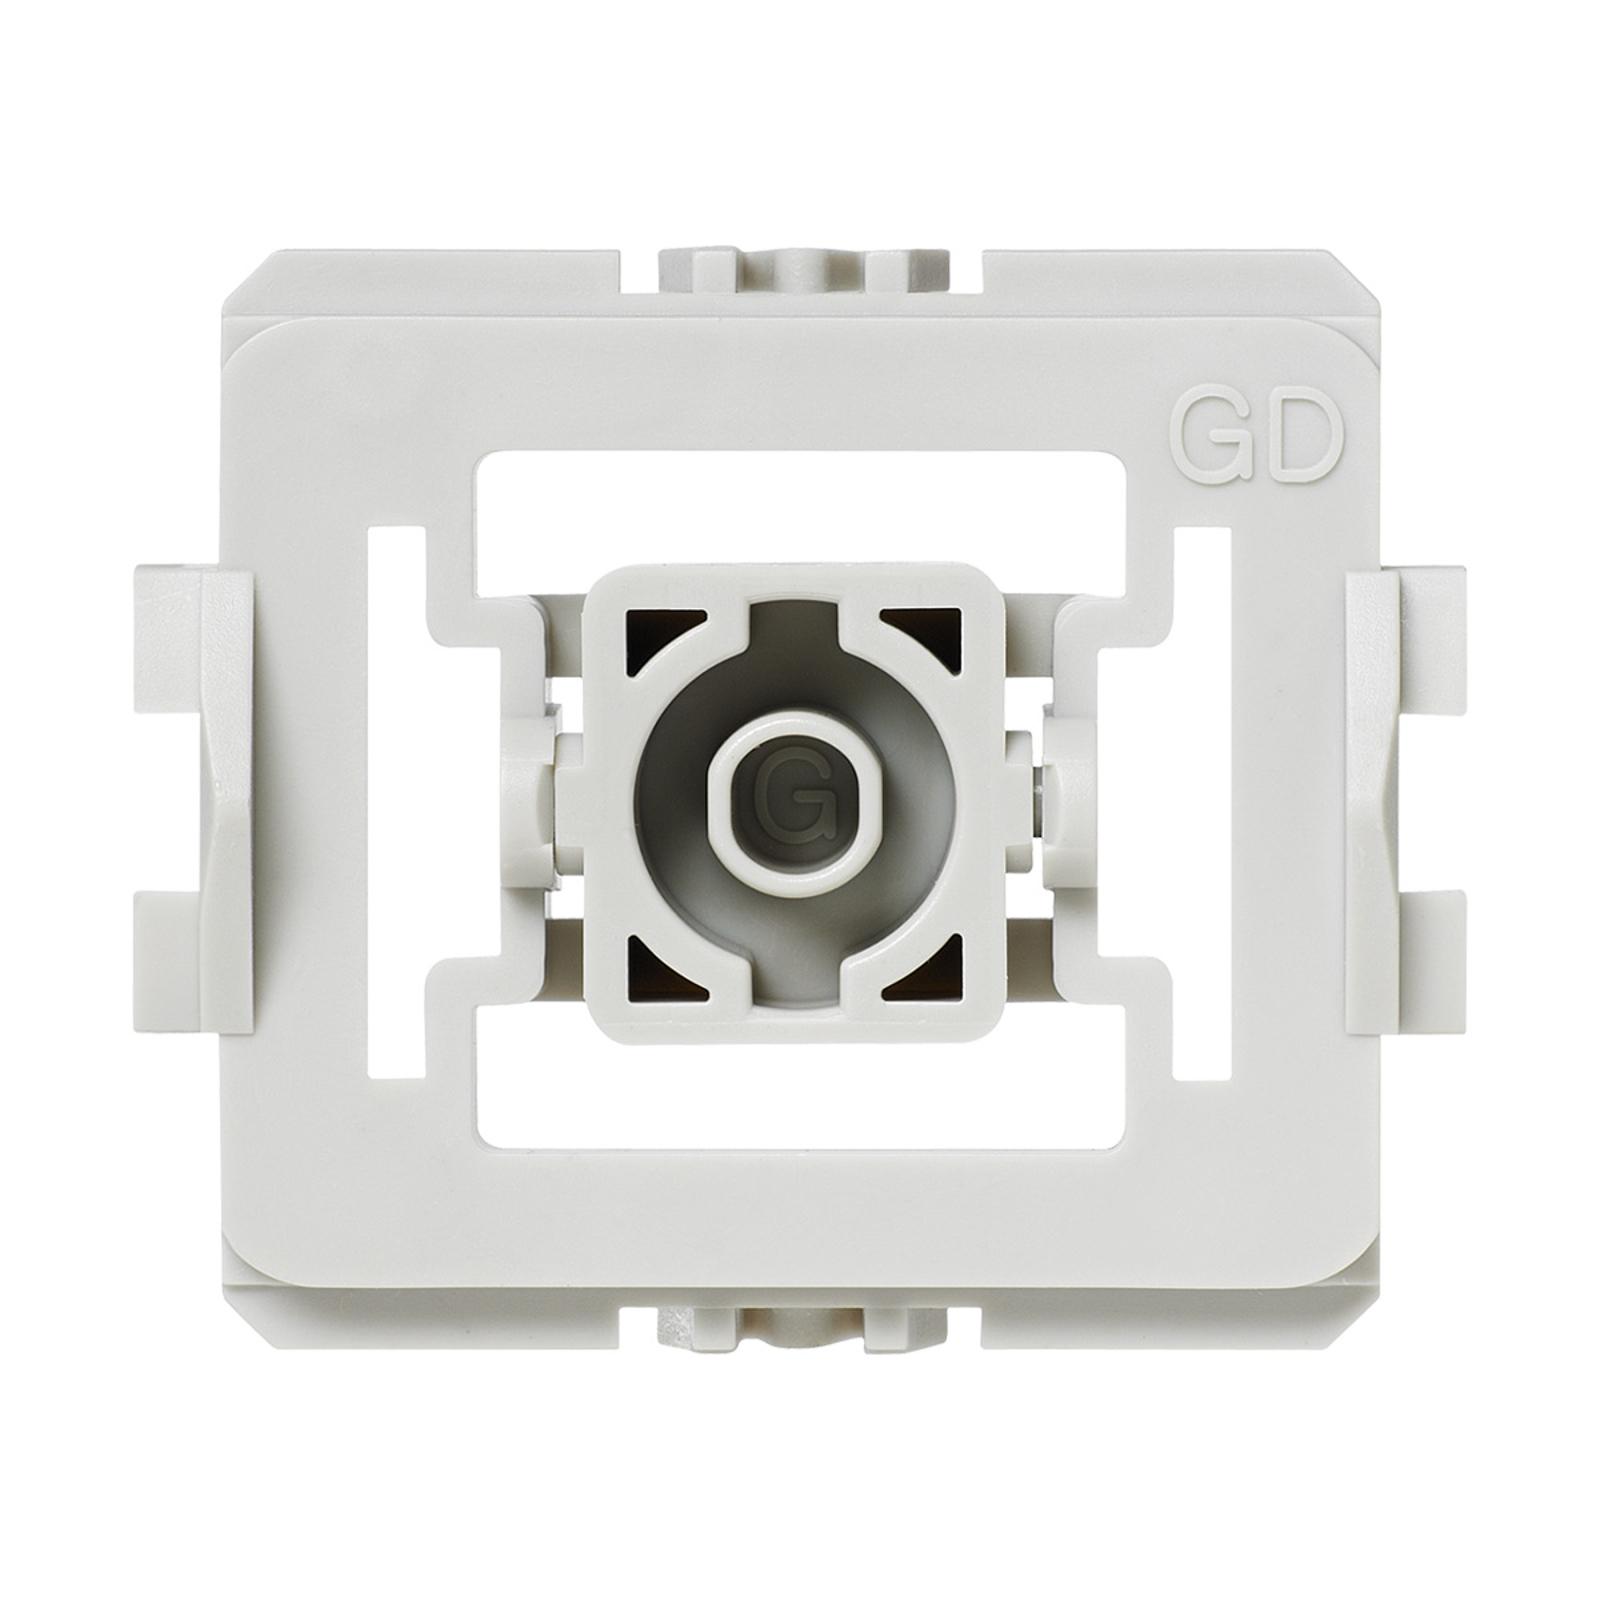 Homematic IP-adapter for Gira standard 20x